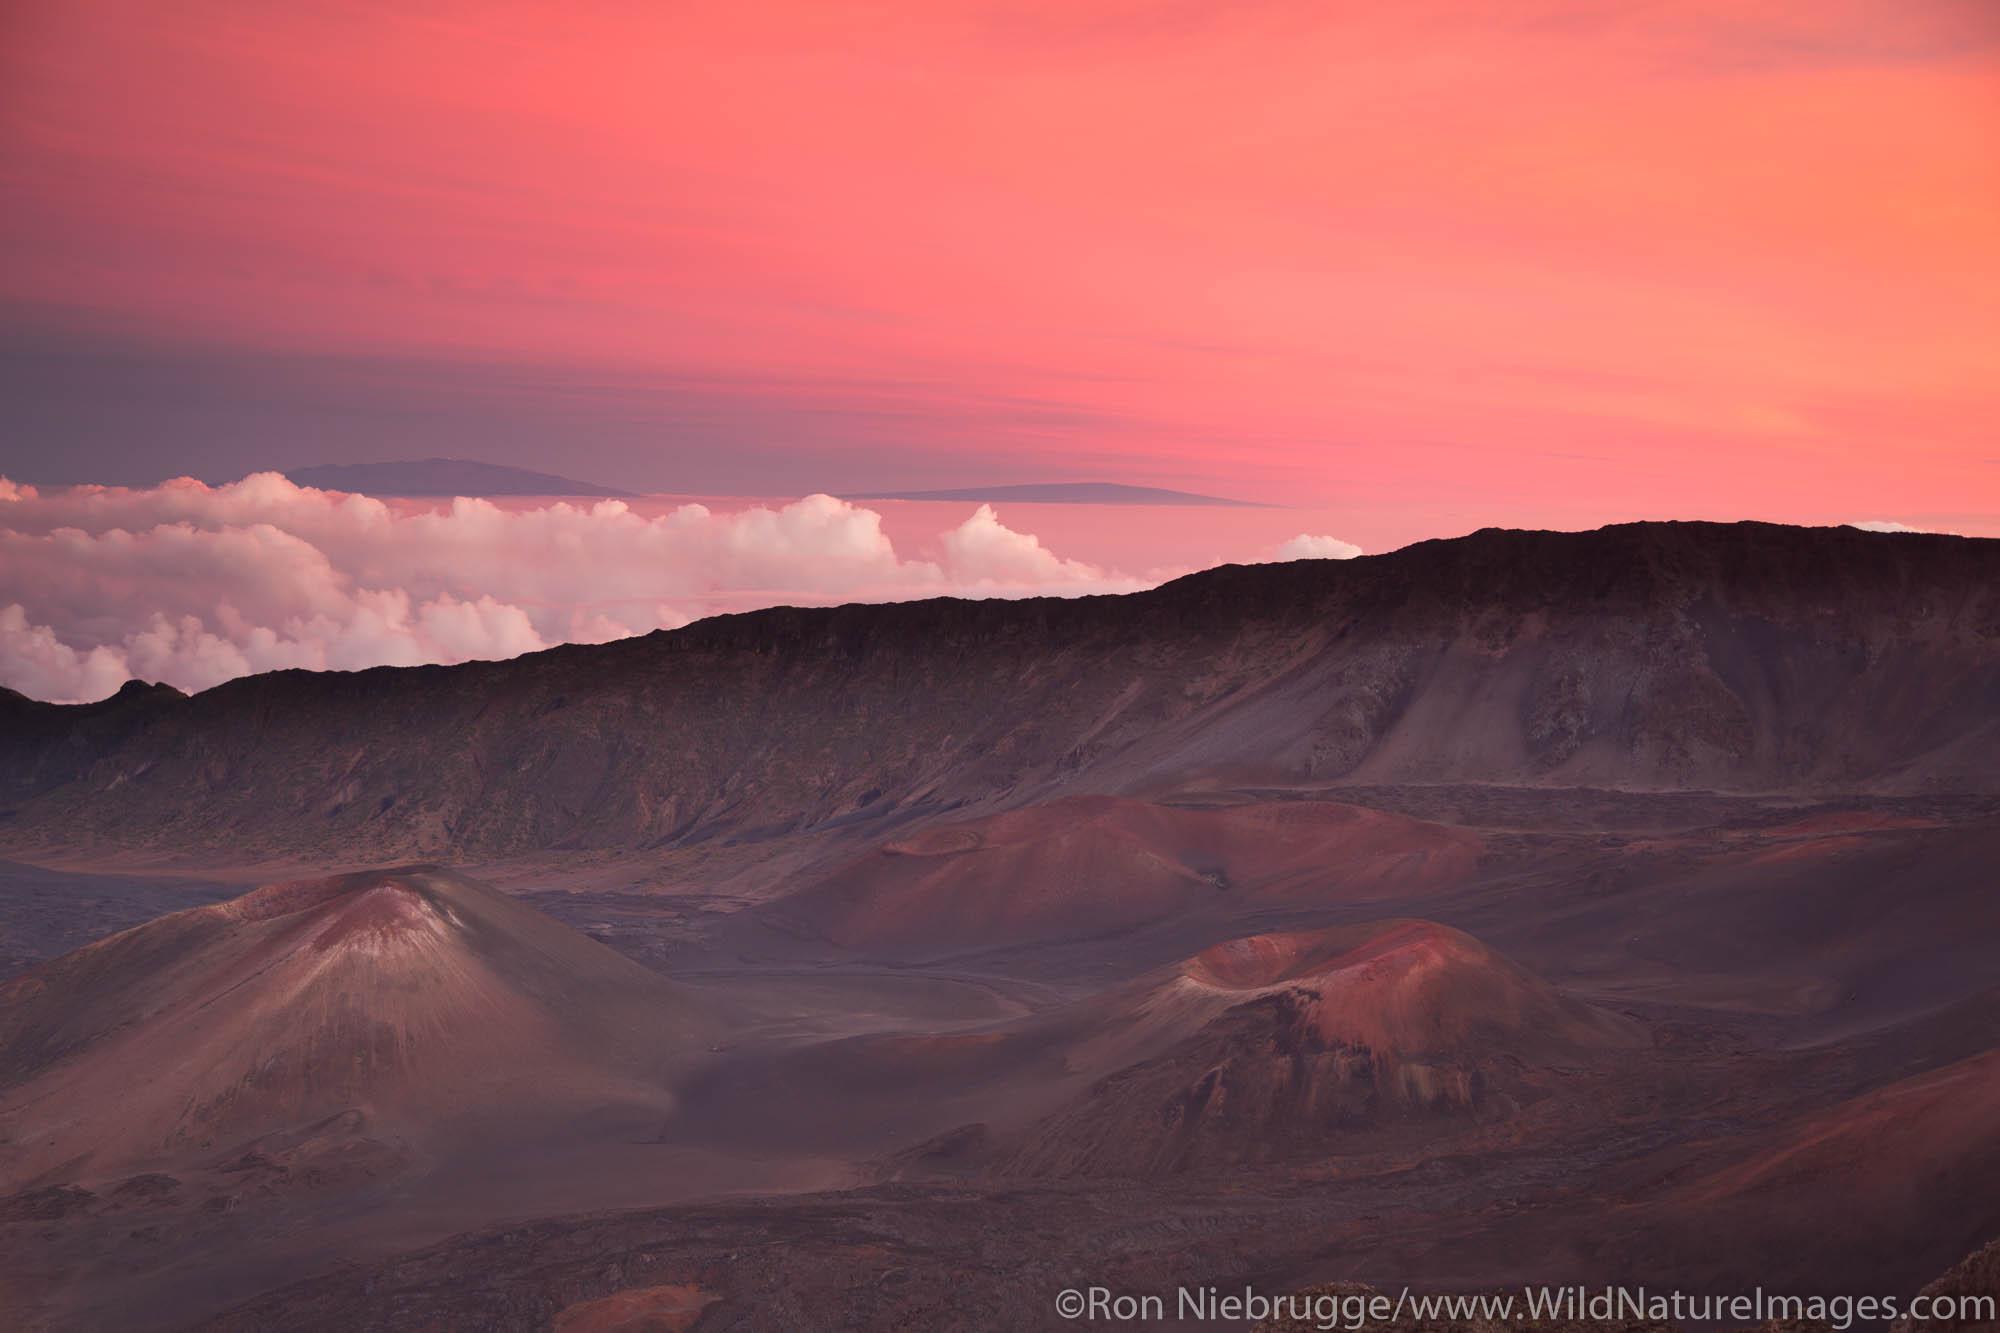 Sunset at the crater of Haleakala, Haleakala National Park, Maui, Hawaii.